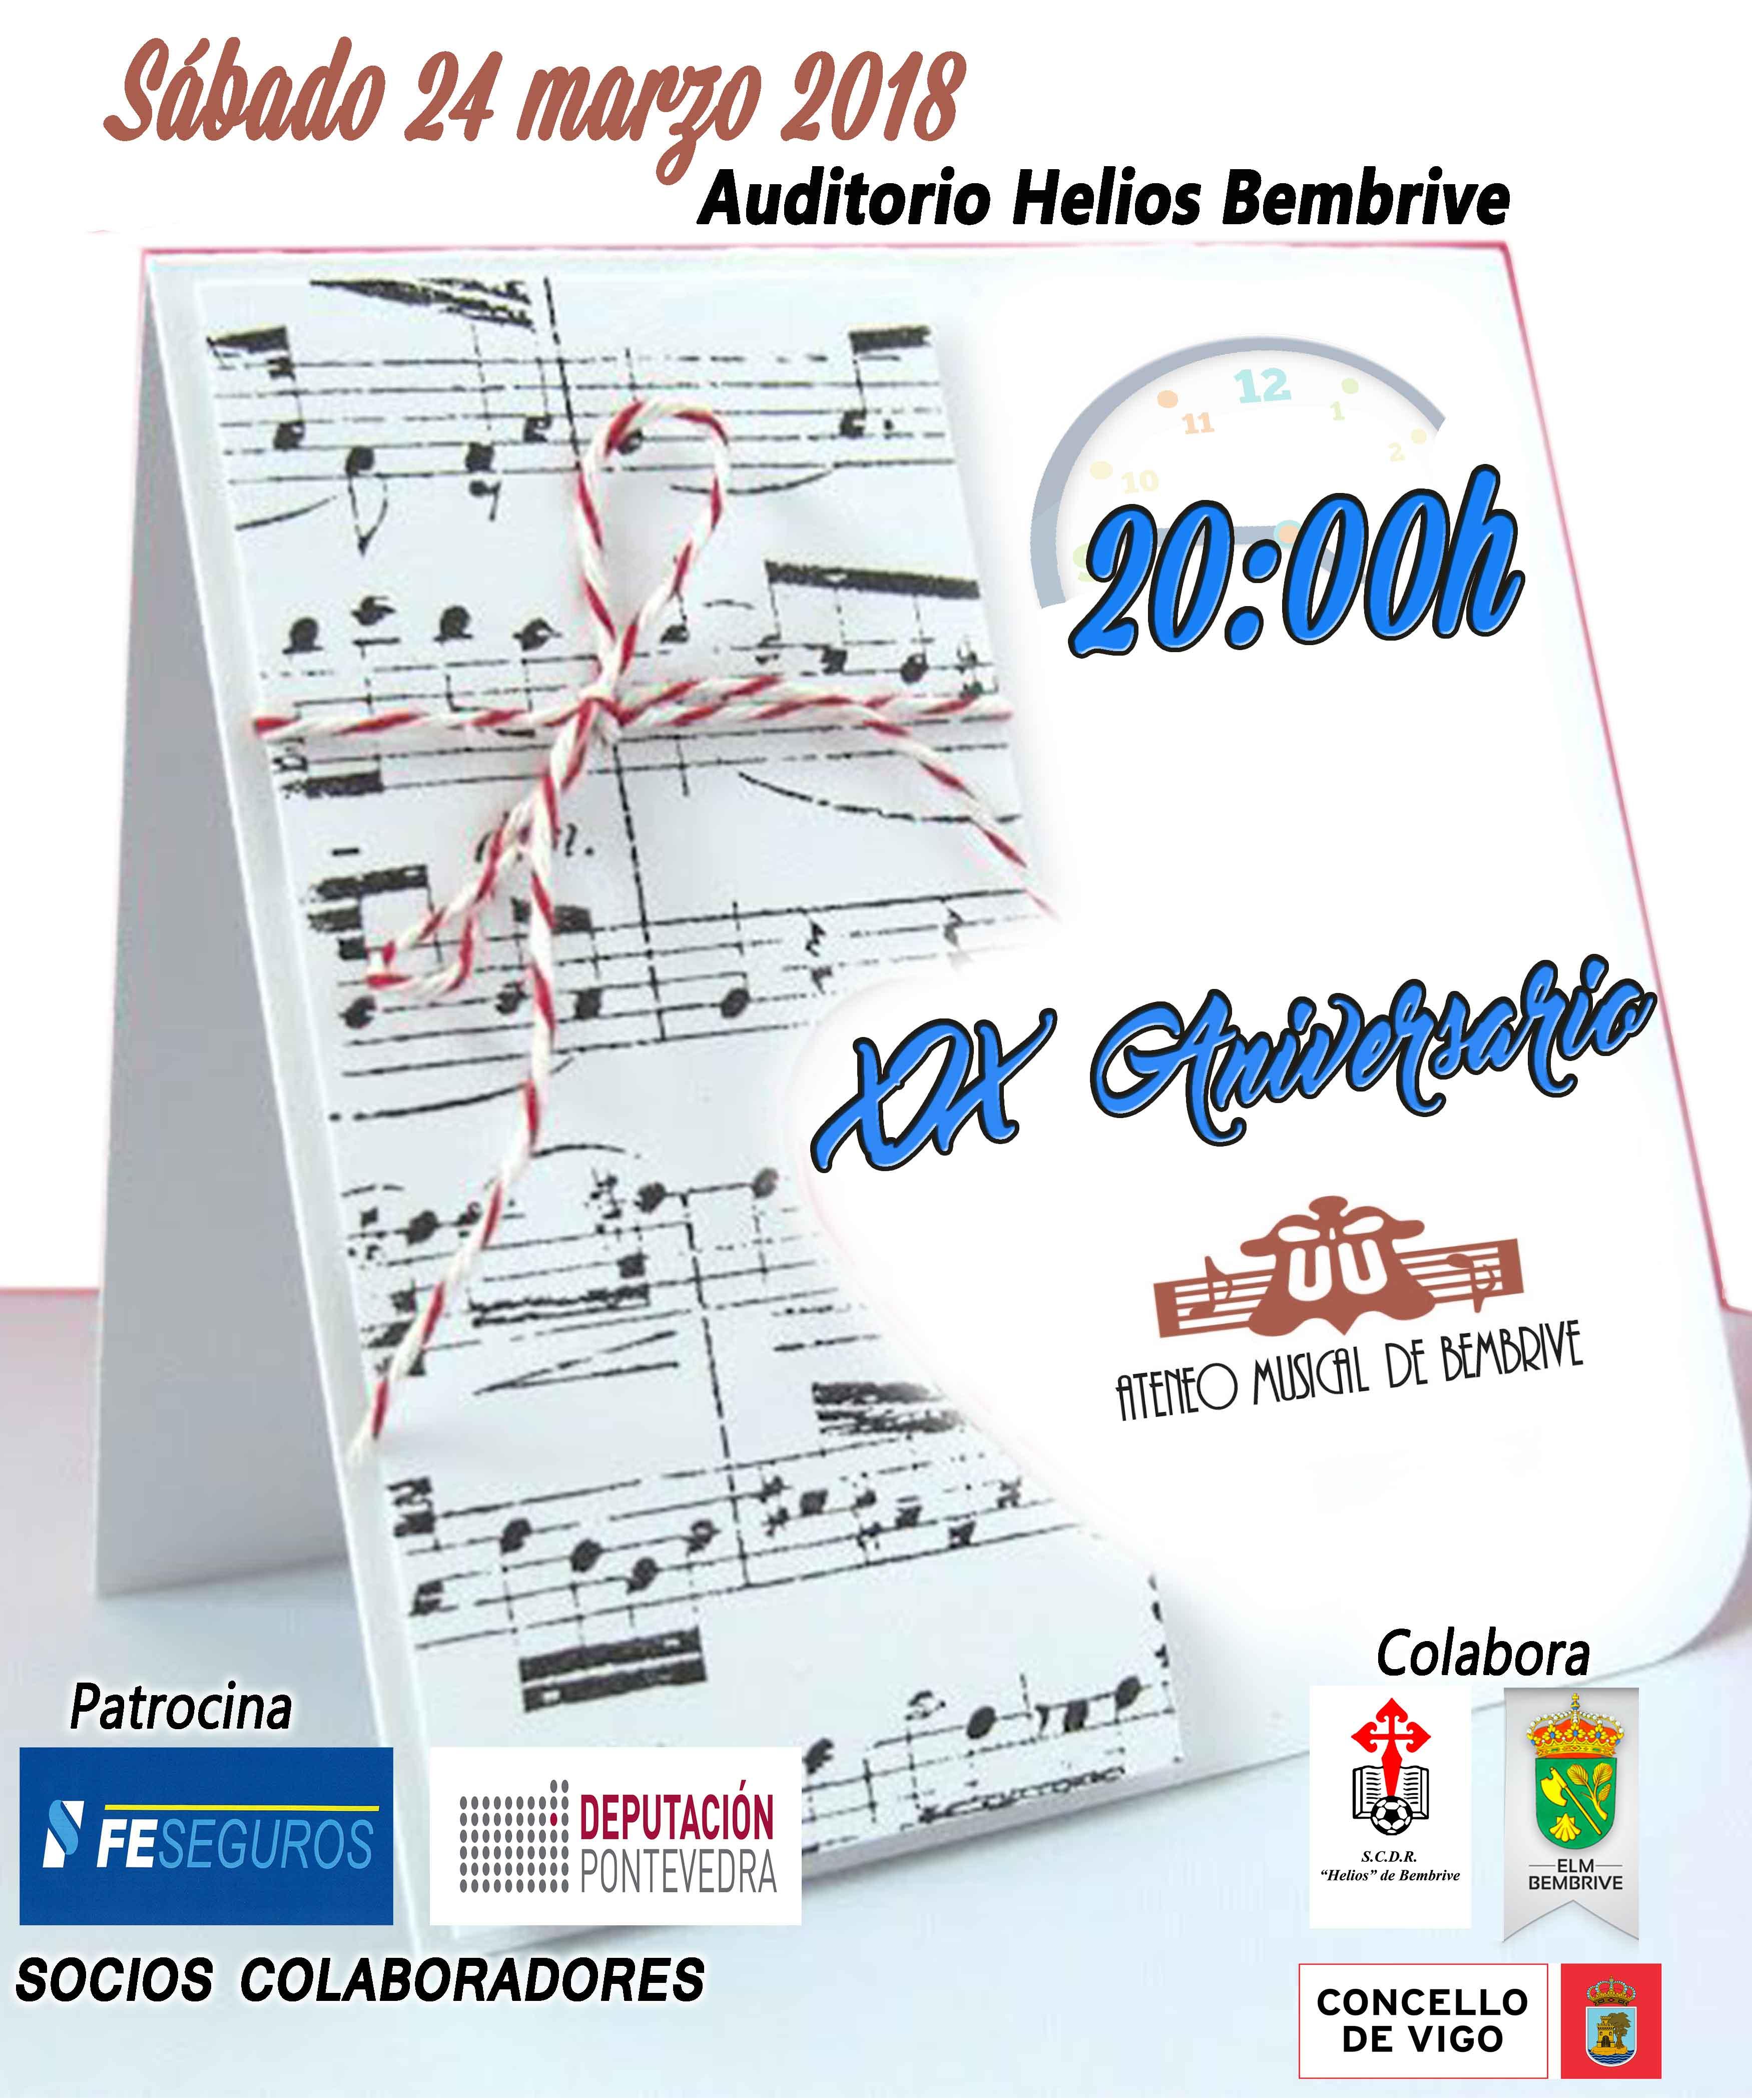 XIX Aniversario Ateneo Musical De Bembrive